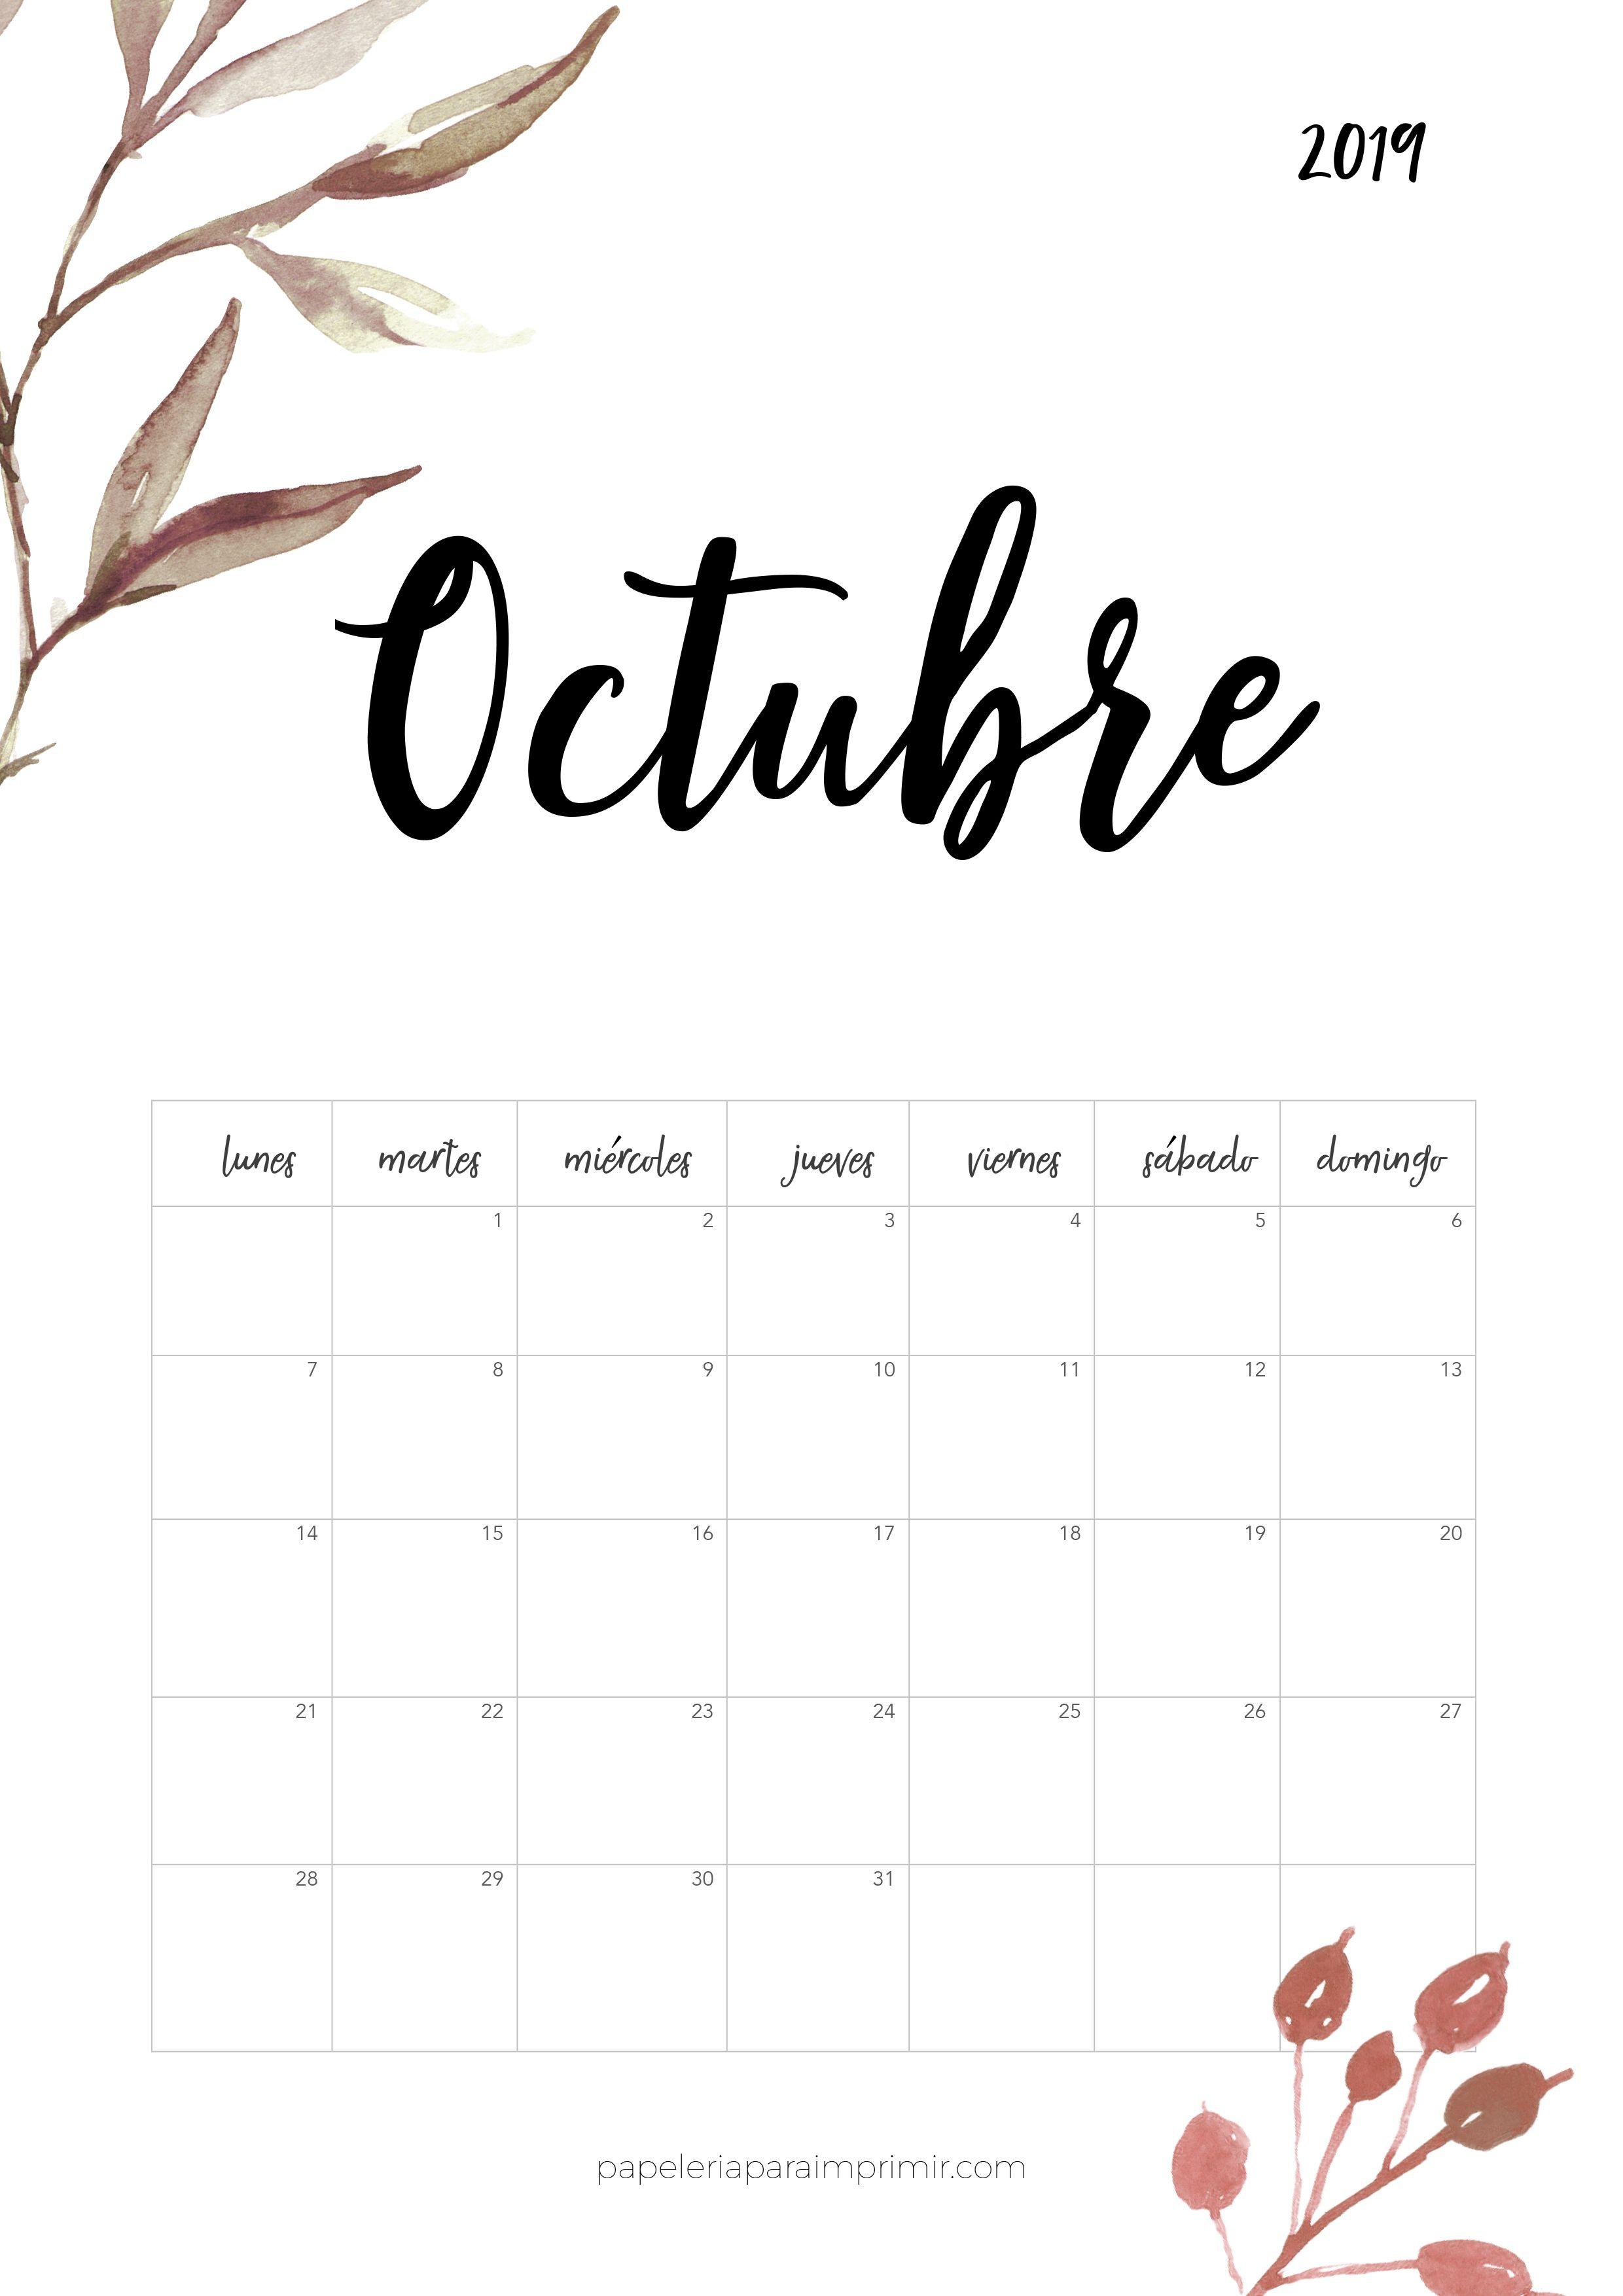 Calendario Mes De Octubre 2020 Para Imprimir.Calendario Para Imprimir 2019 Octubre Calendario